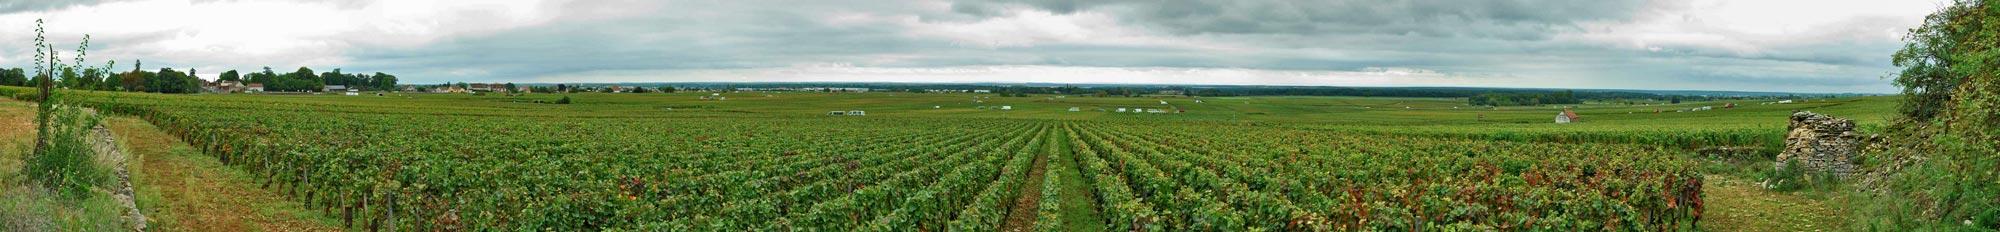 Gevrey-Chambertin harvest 2010